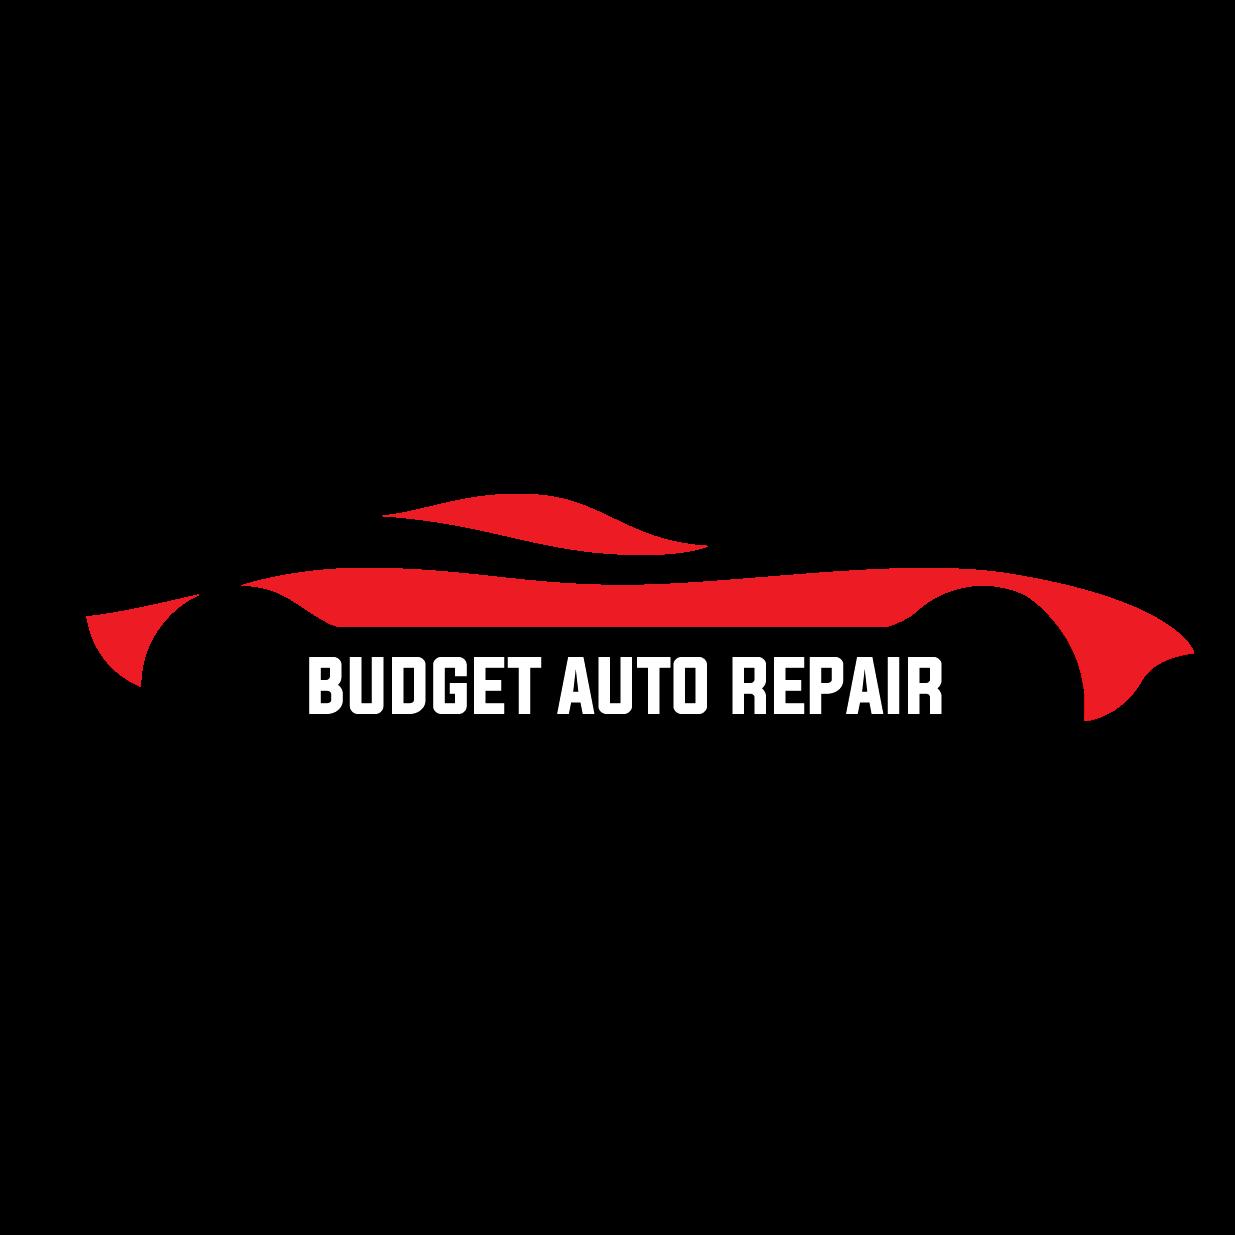 Budget Auto Repair & Transmission - Moreno Valley, CA - General Auto Repair & Service